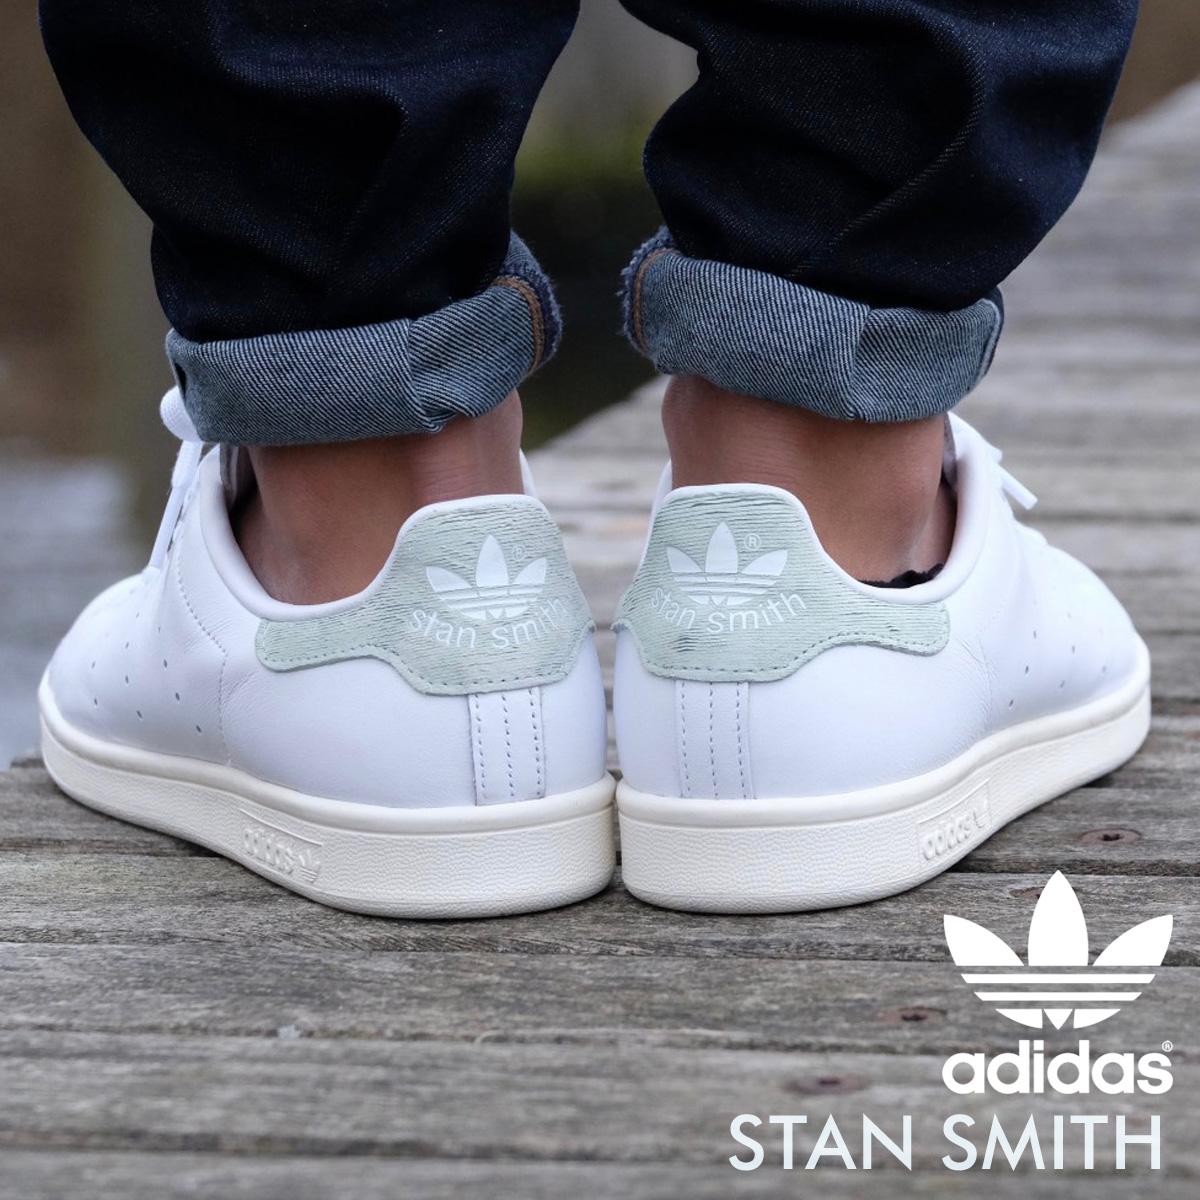 adidas Stan Smith Adidas originals sneakers STAN SMITH Lady's men BB5047 shoes white [7/21 Shinnyu load] [177]